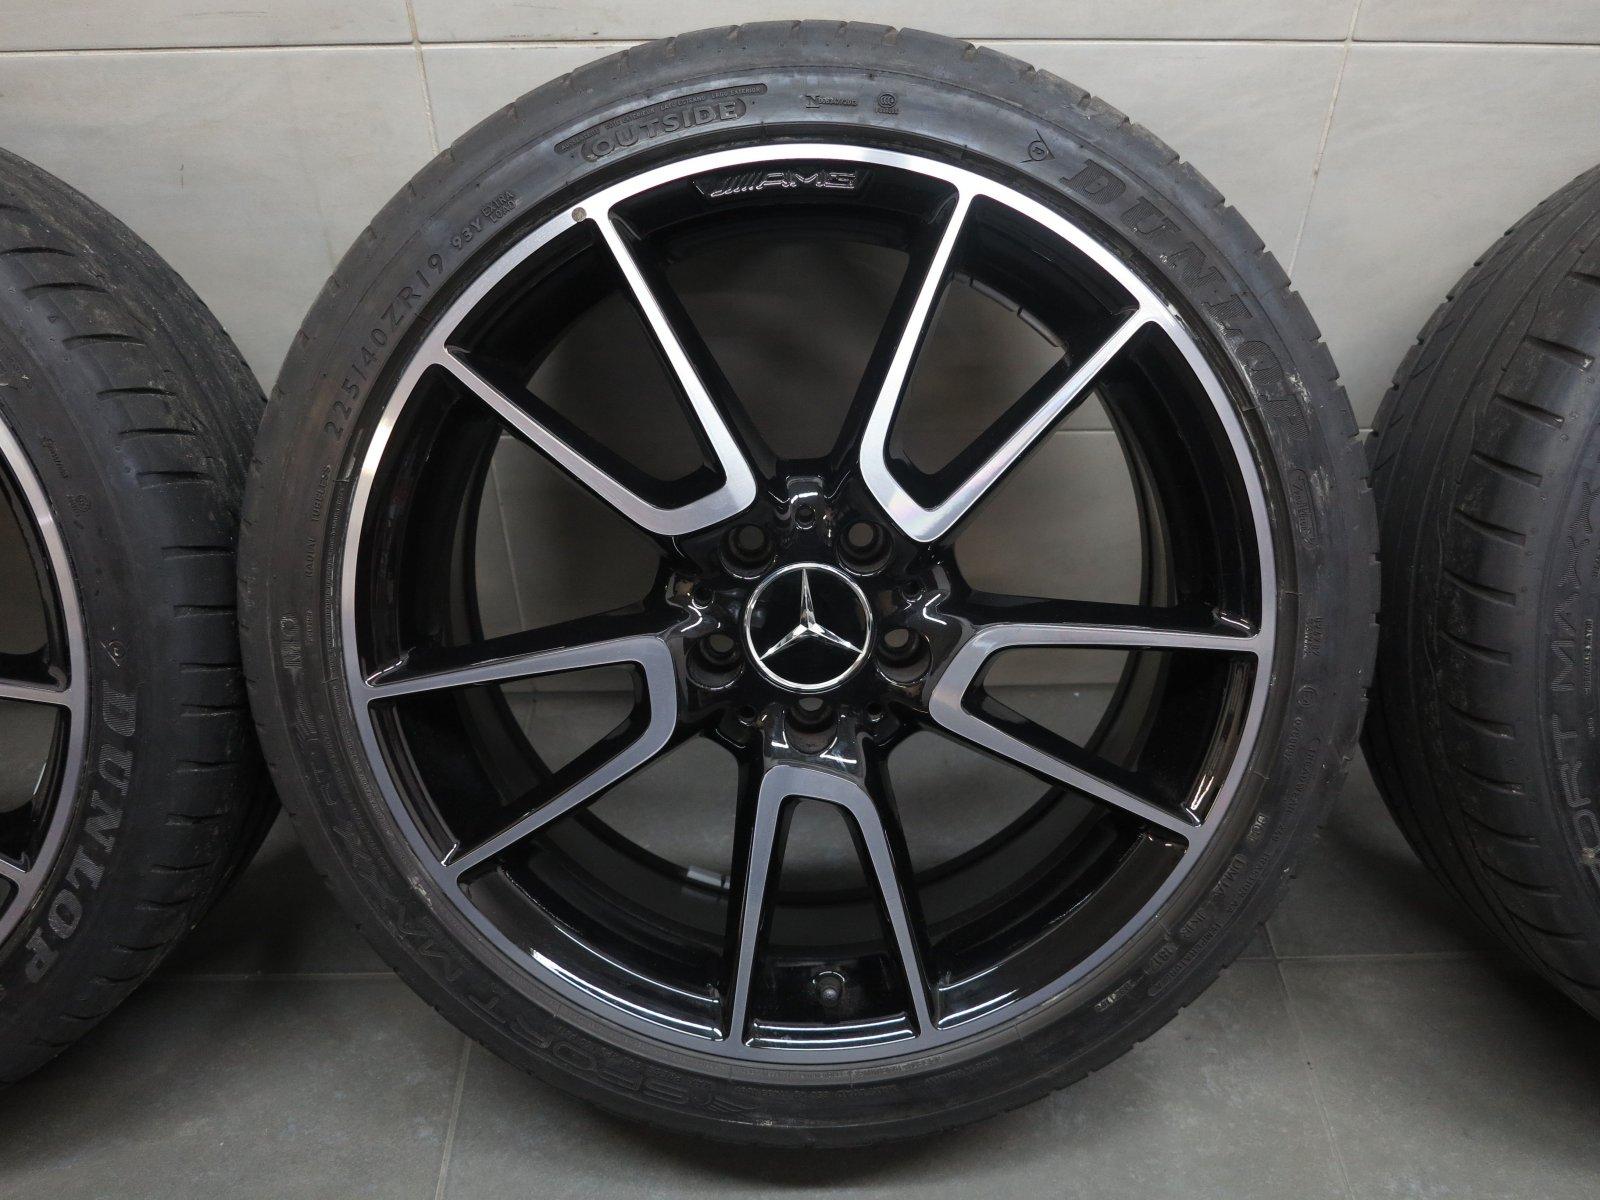 19 inch summer wheels original mercedes c class c43 amg c450 sport rims a47 ebay. Black Bedroom Furniture Sets. Home Design Ideas